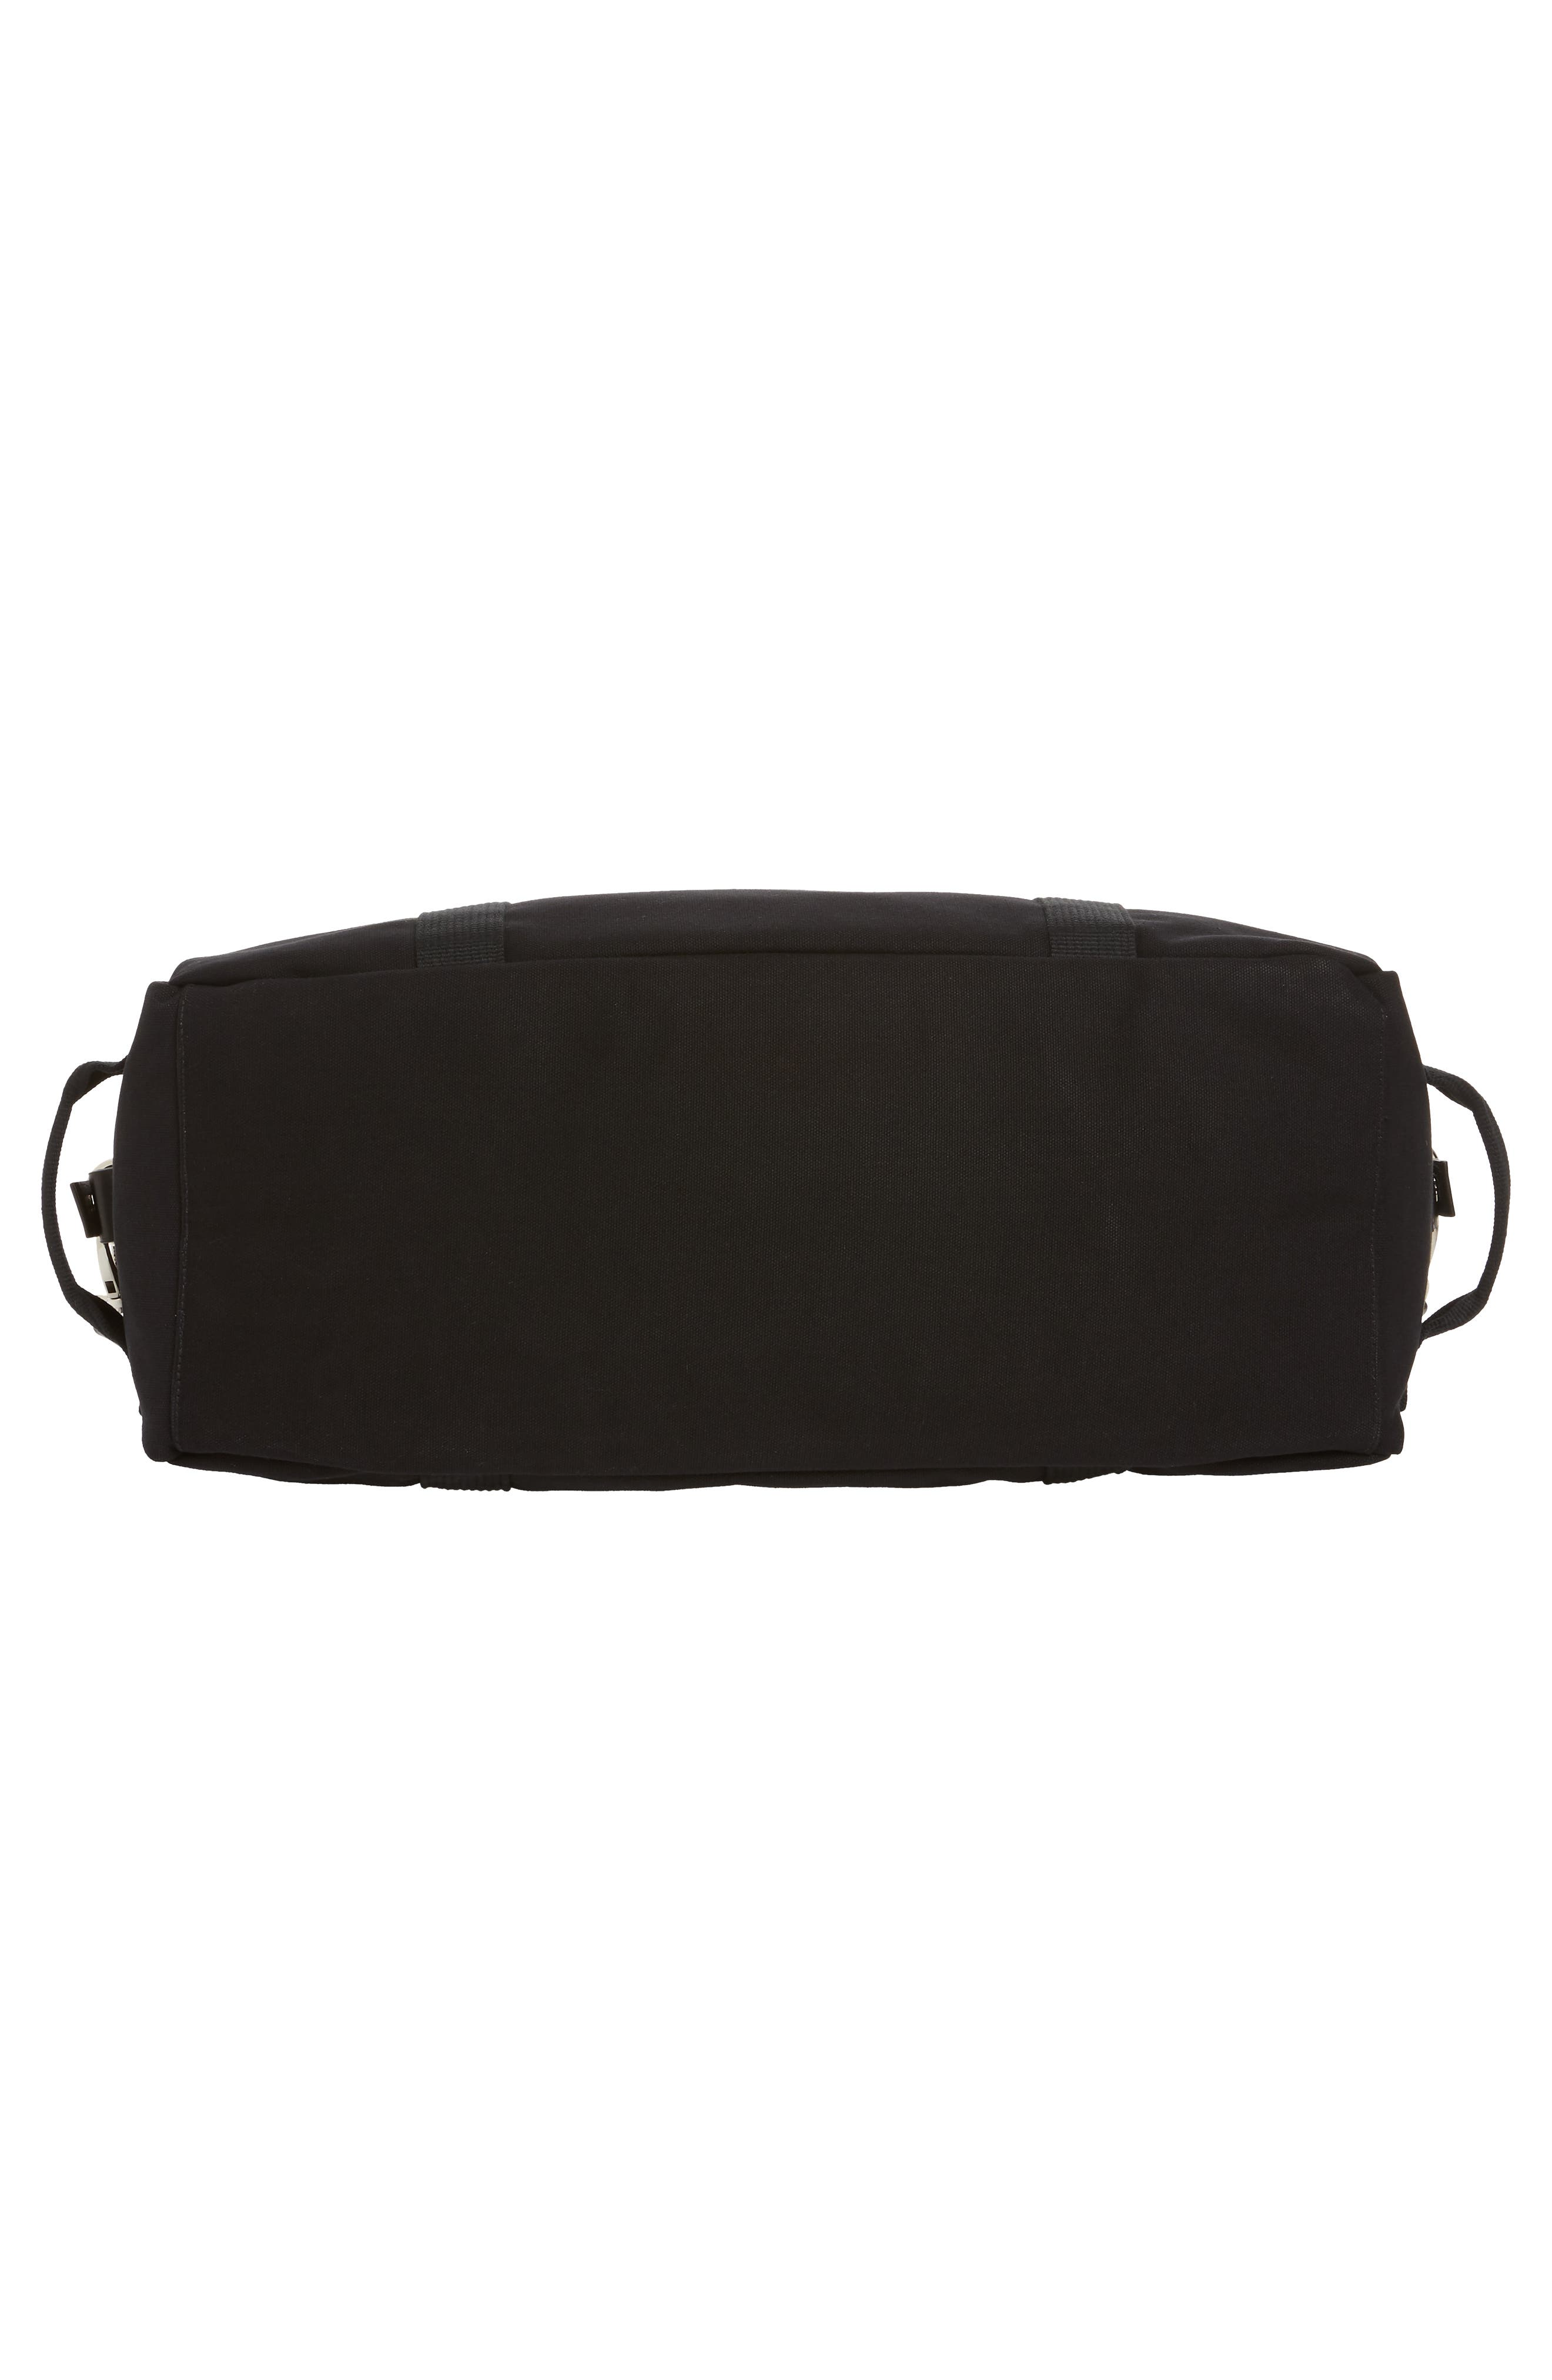 Norfolk Water Repellent Duffel Bag,                             Alternate thumbnail 6, color,                             BLACK